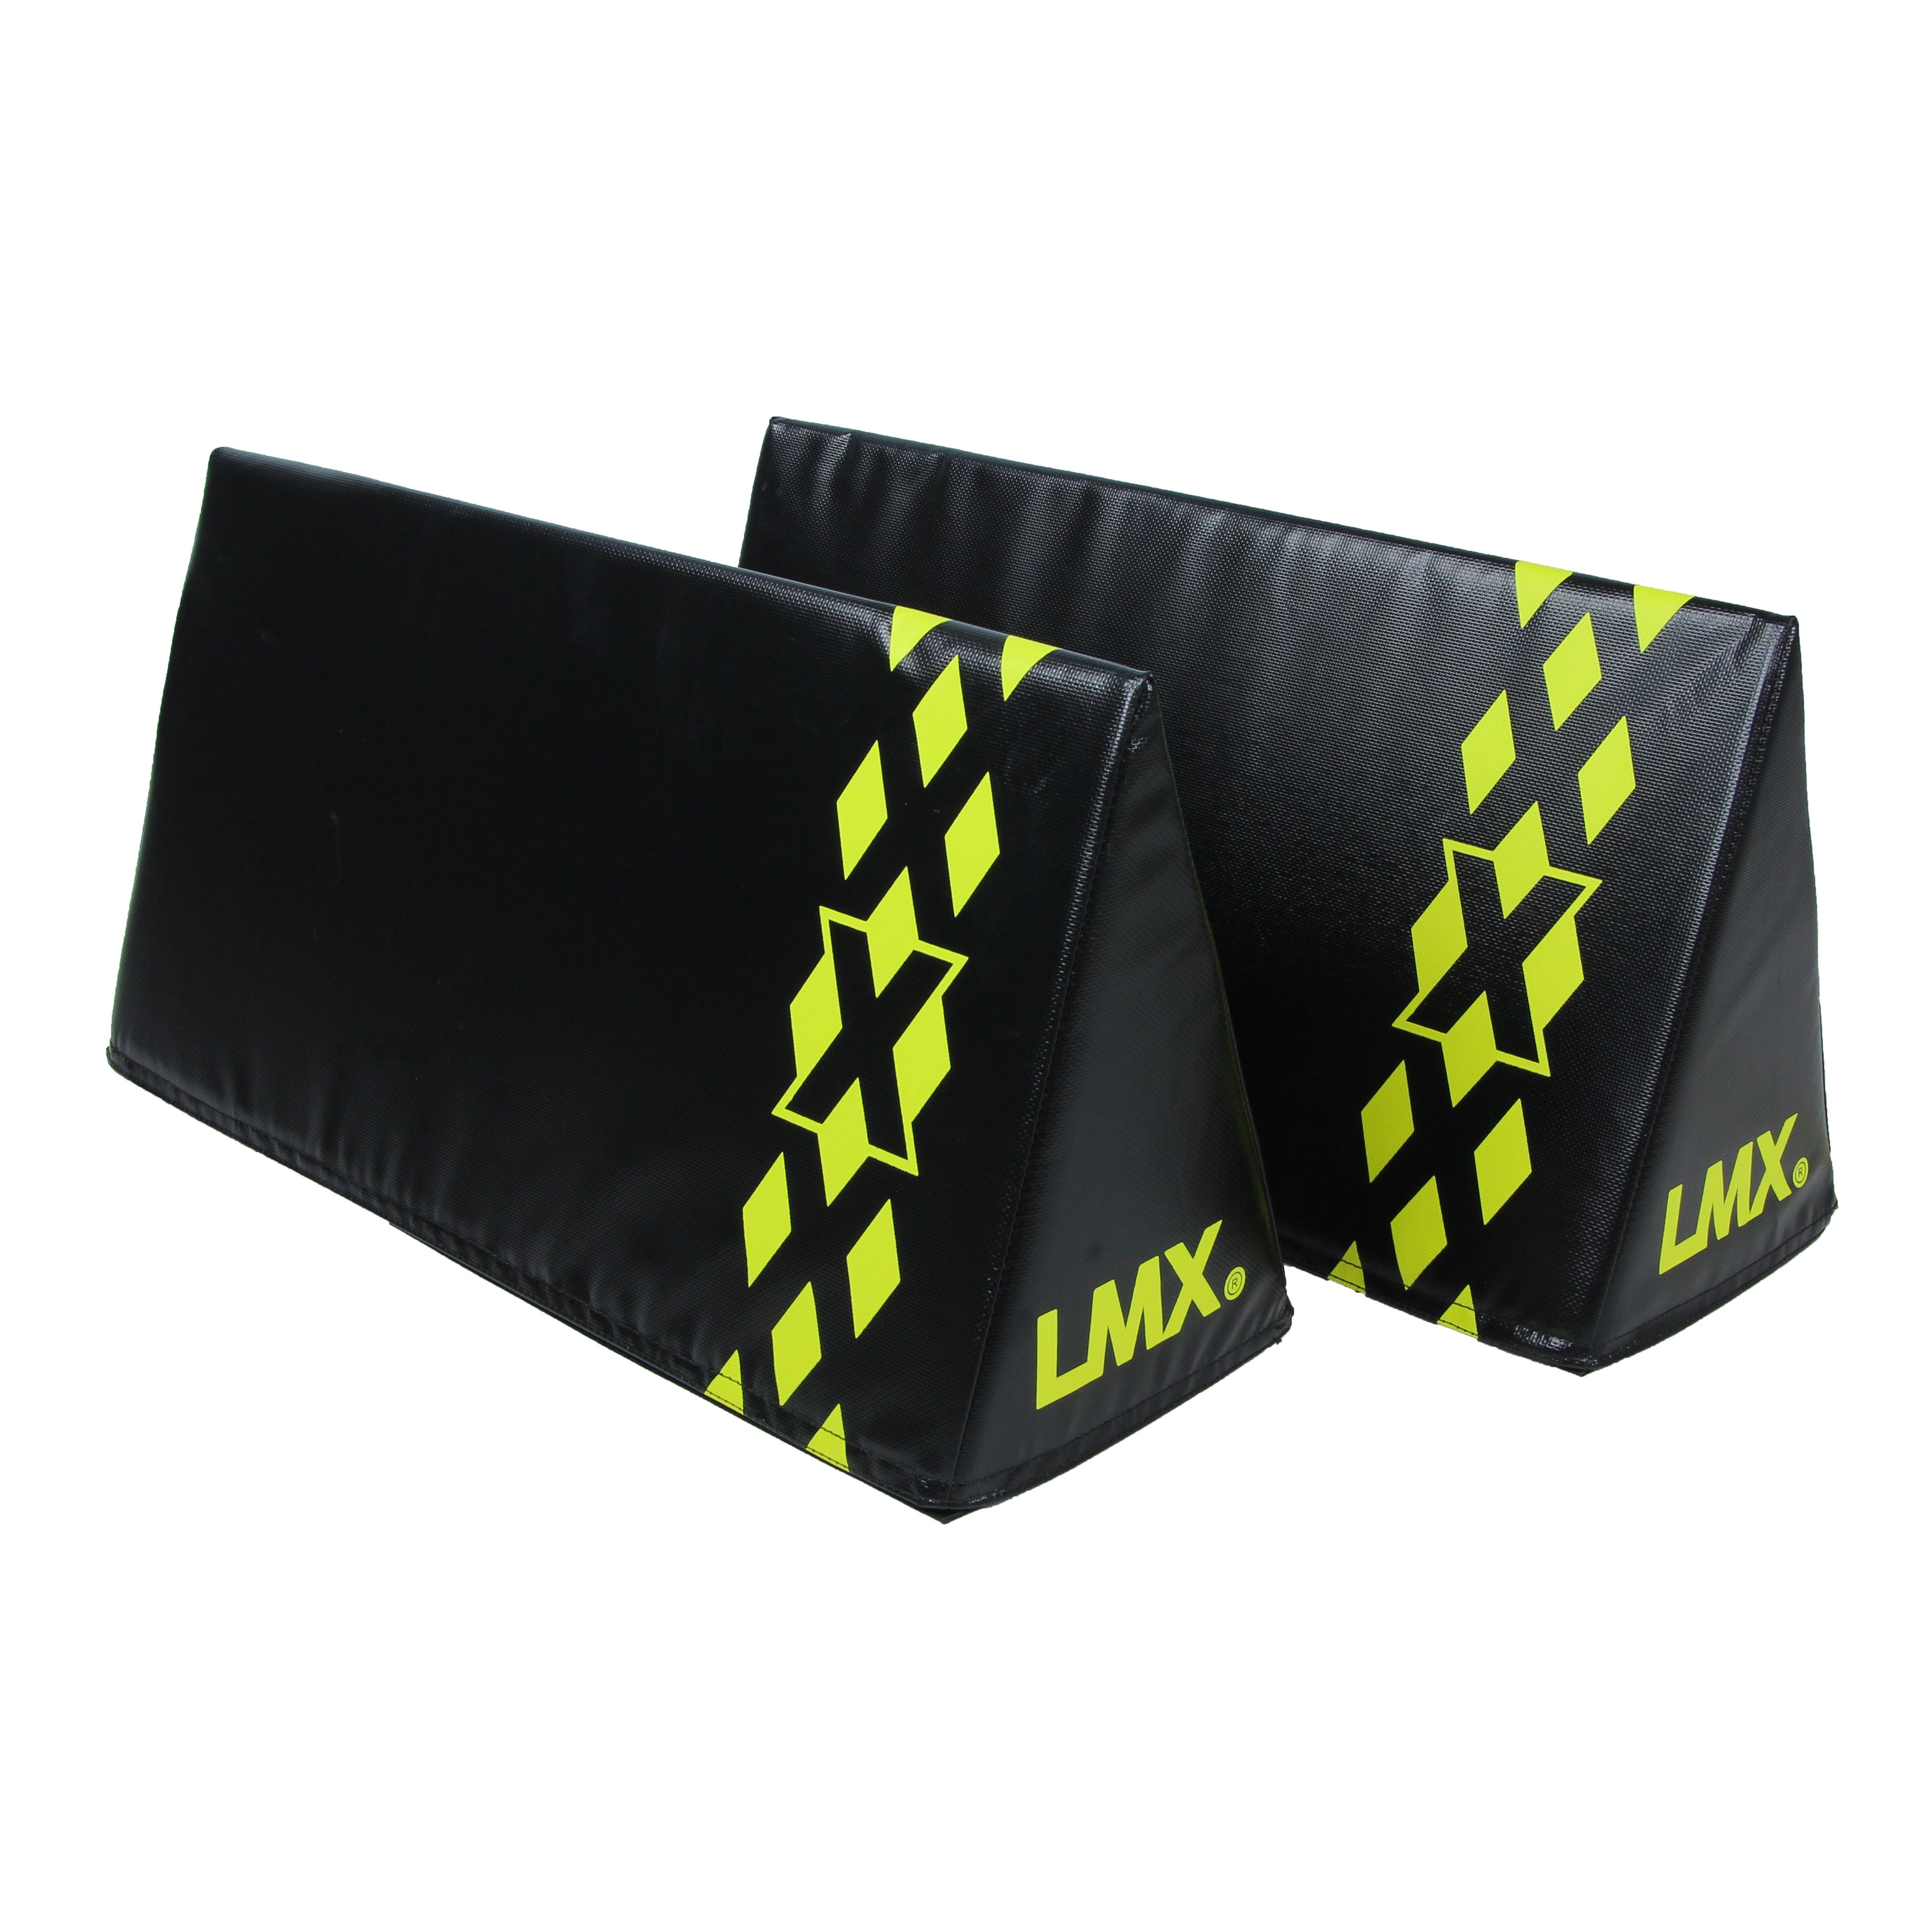 LMX. Soft Hurdle Sprinthække (2 Stk.)